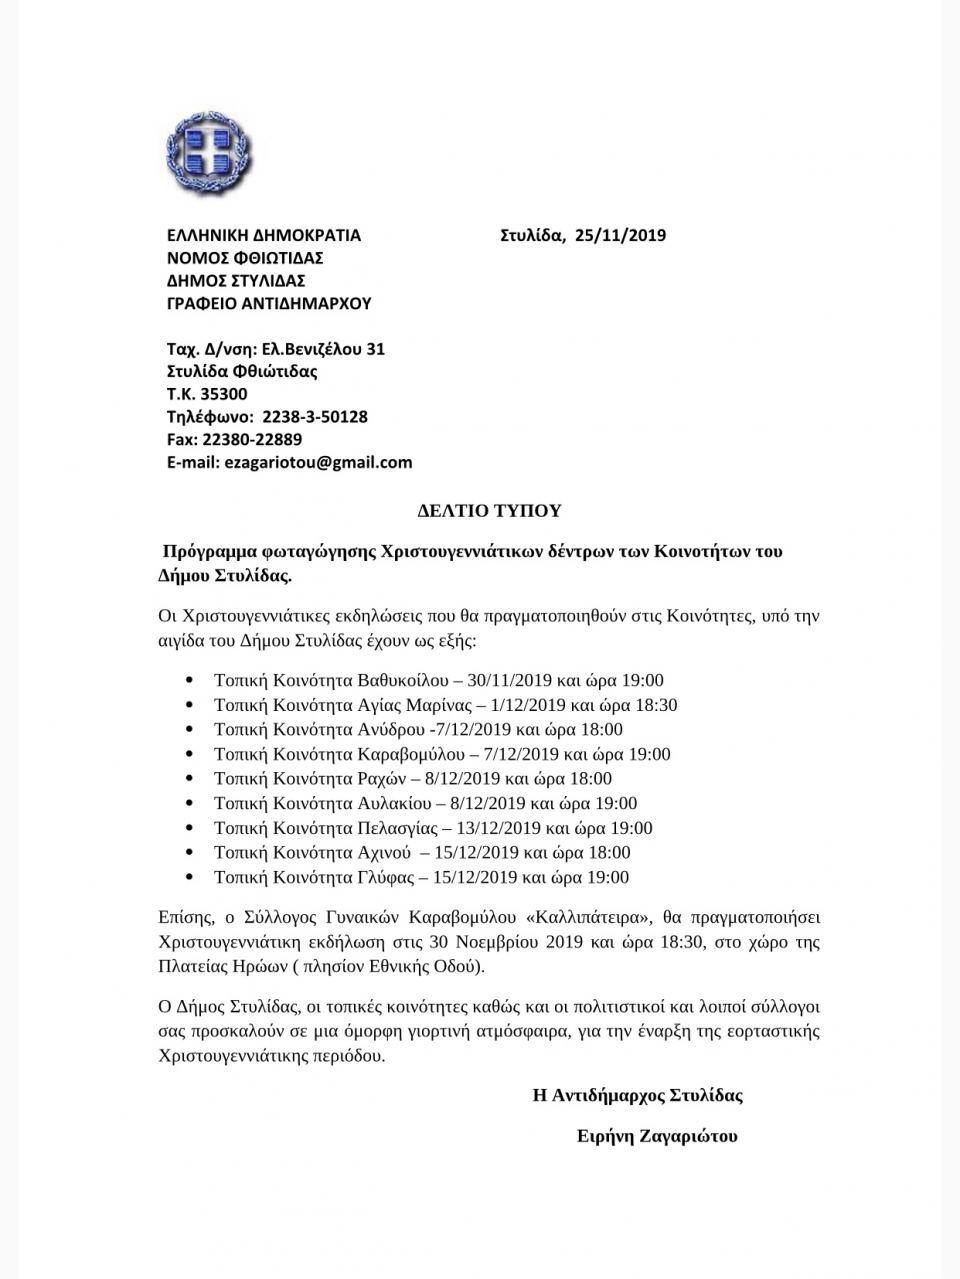 img 5255 ΧΡΙΣΤΟΥΓΕΝΝΑ 2019 ΔΗΜΟΣ ΣΤΥΛΙΔΑΣ ΑΝΑΜΜΑ ΧΡΙΣΤΟΥΓΕΝΝΙΑΤΙΚΟΥ ΔΕΝΤΡΟΥ